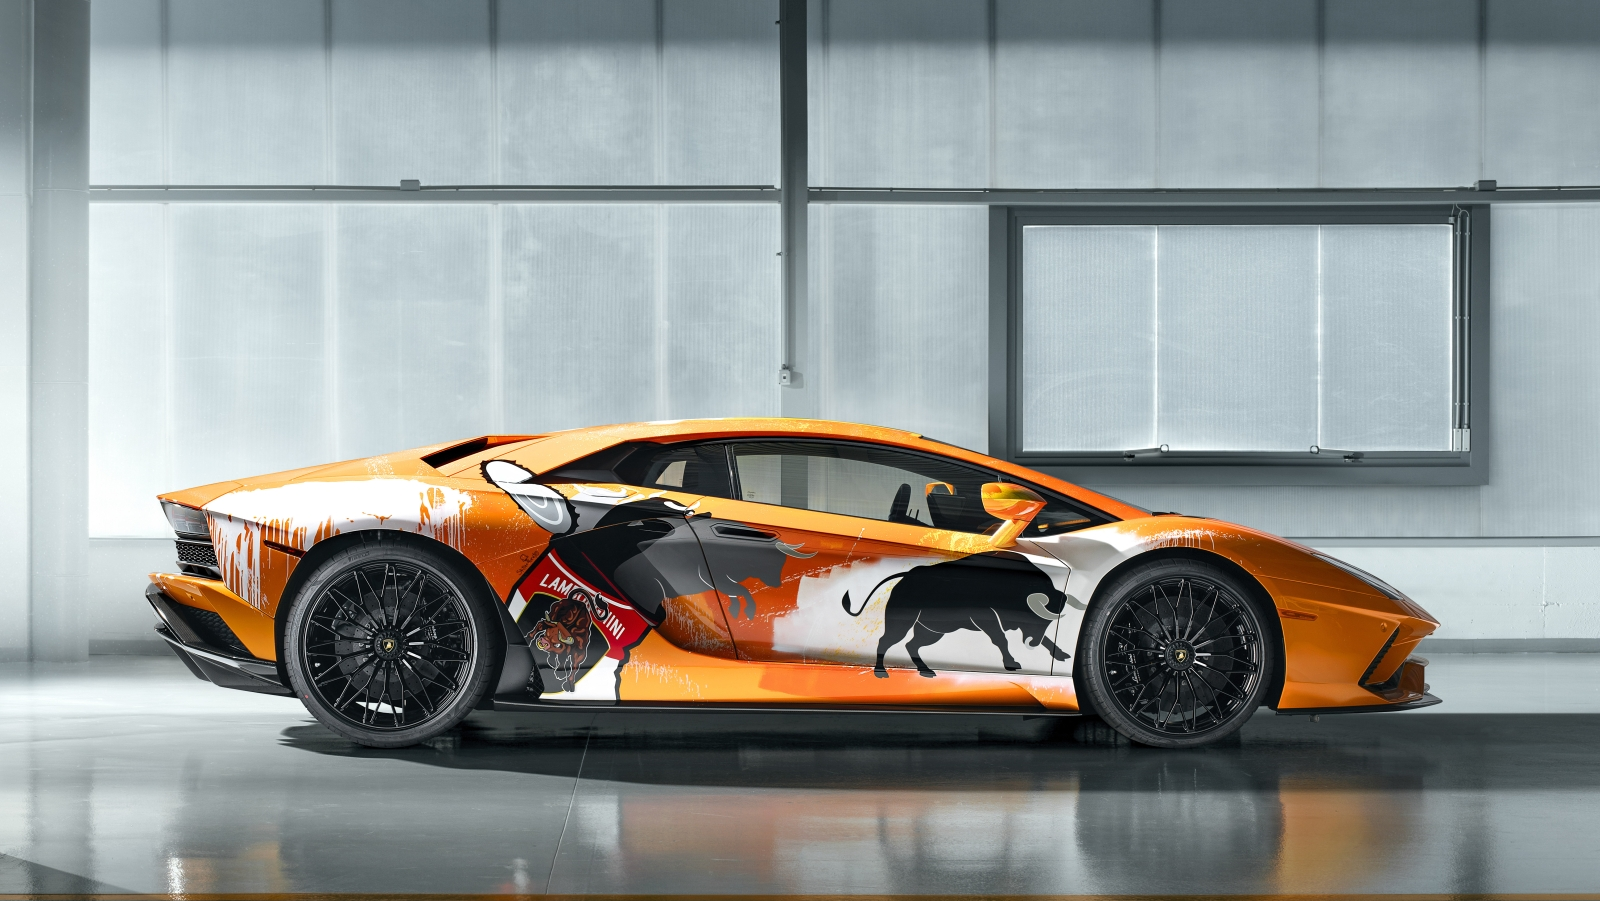 10 ezernél tart a Lamborghini Aventador